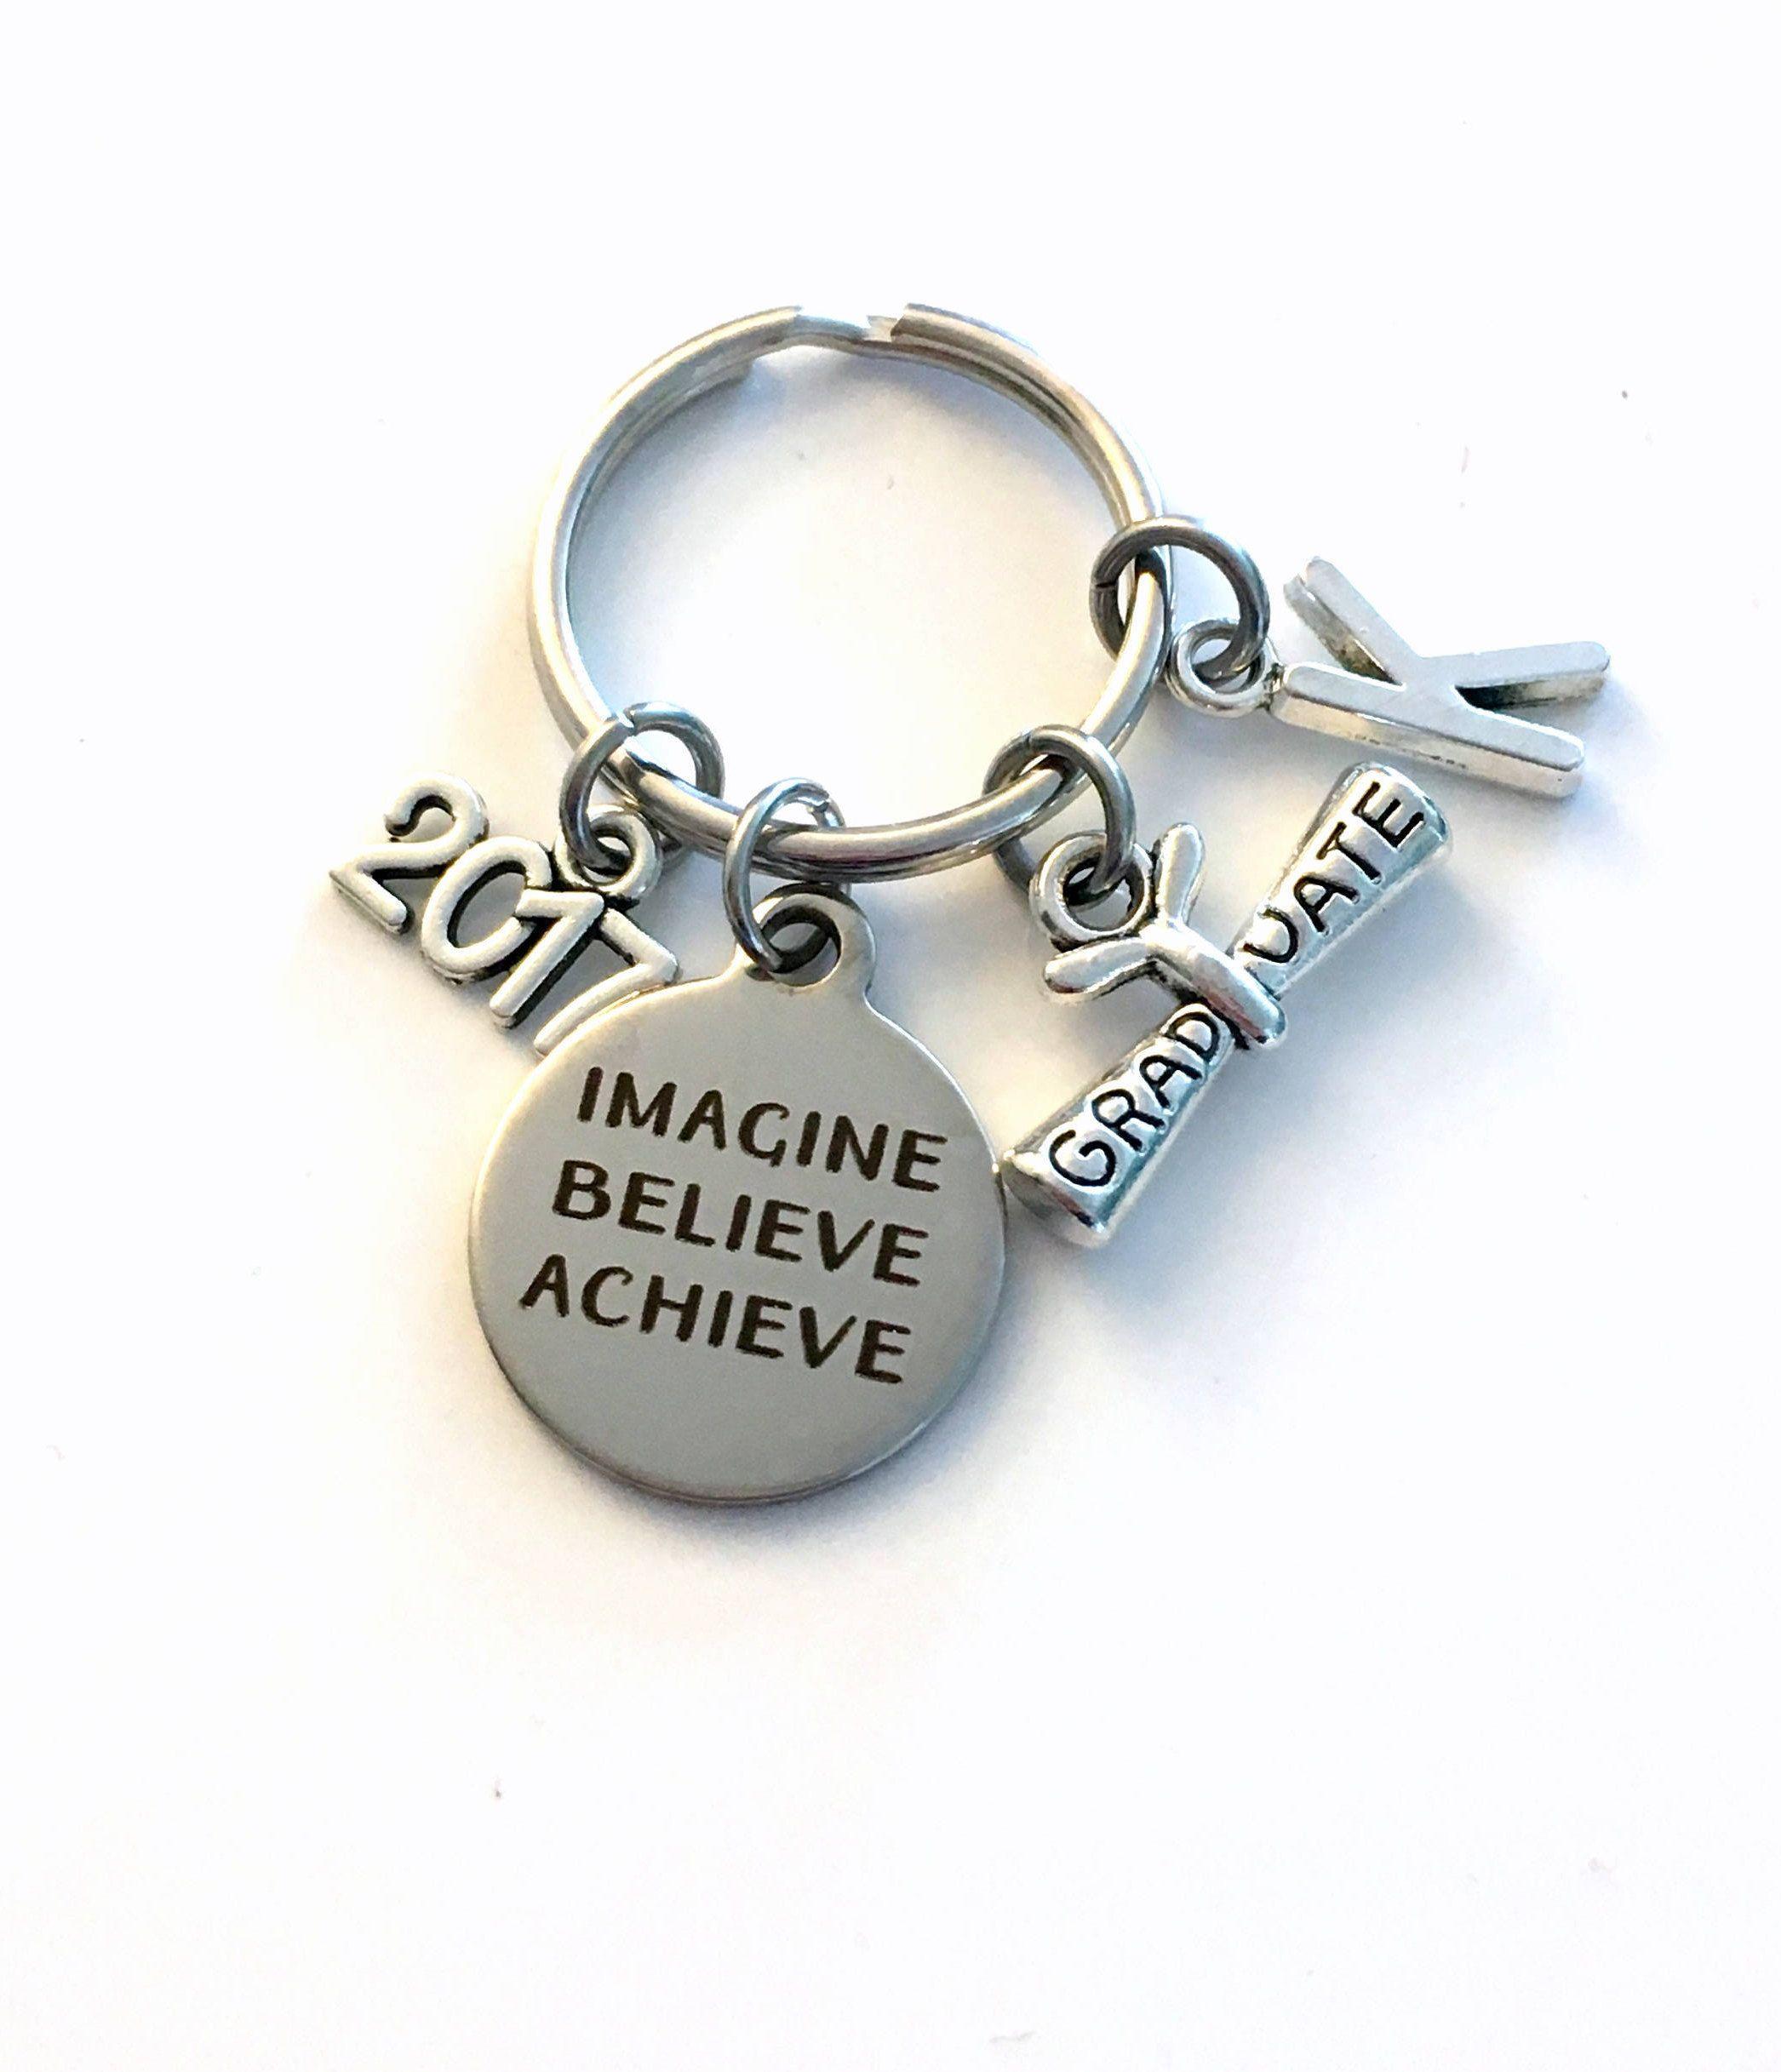 Graduation gift for him keychain imagine believe achieve